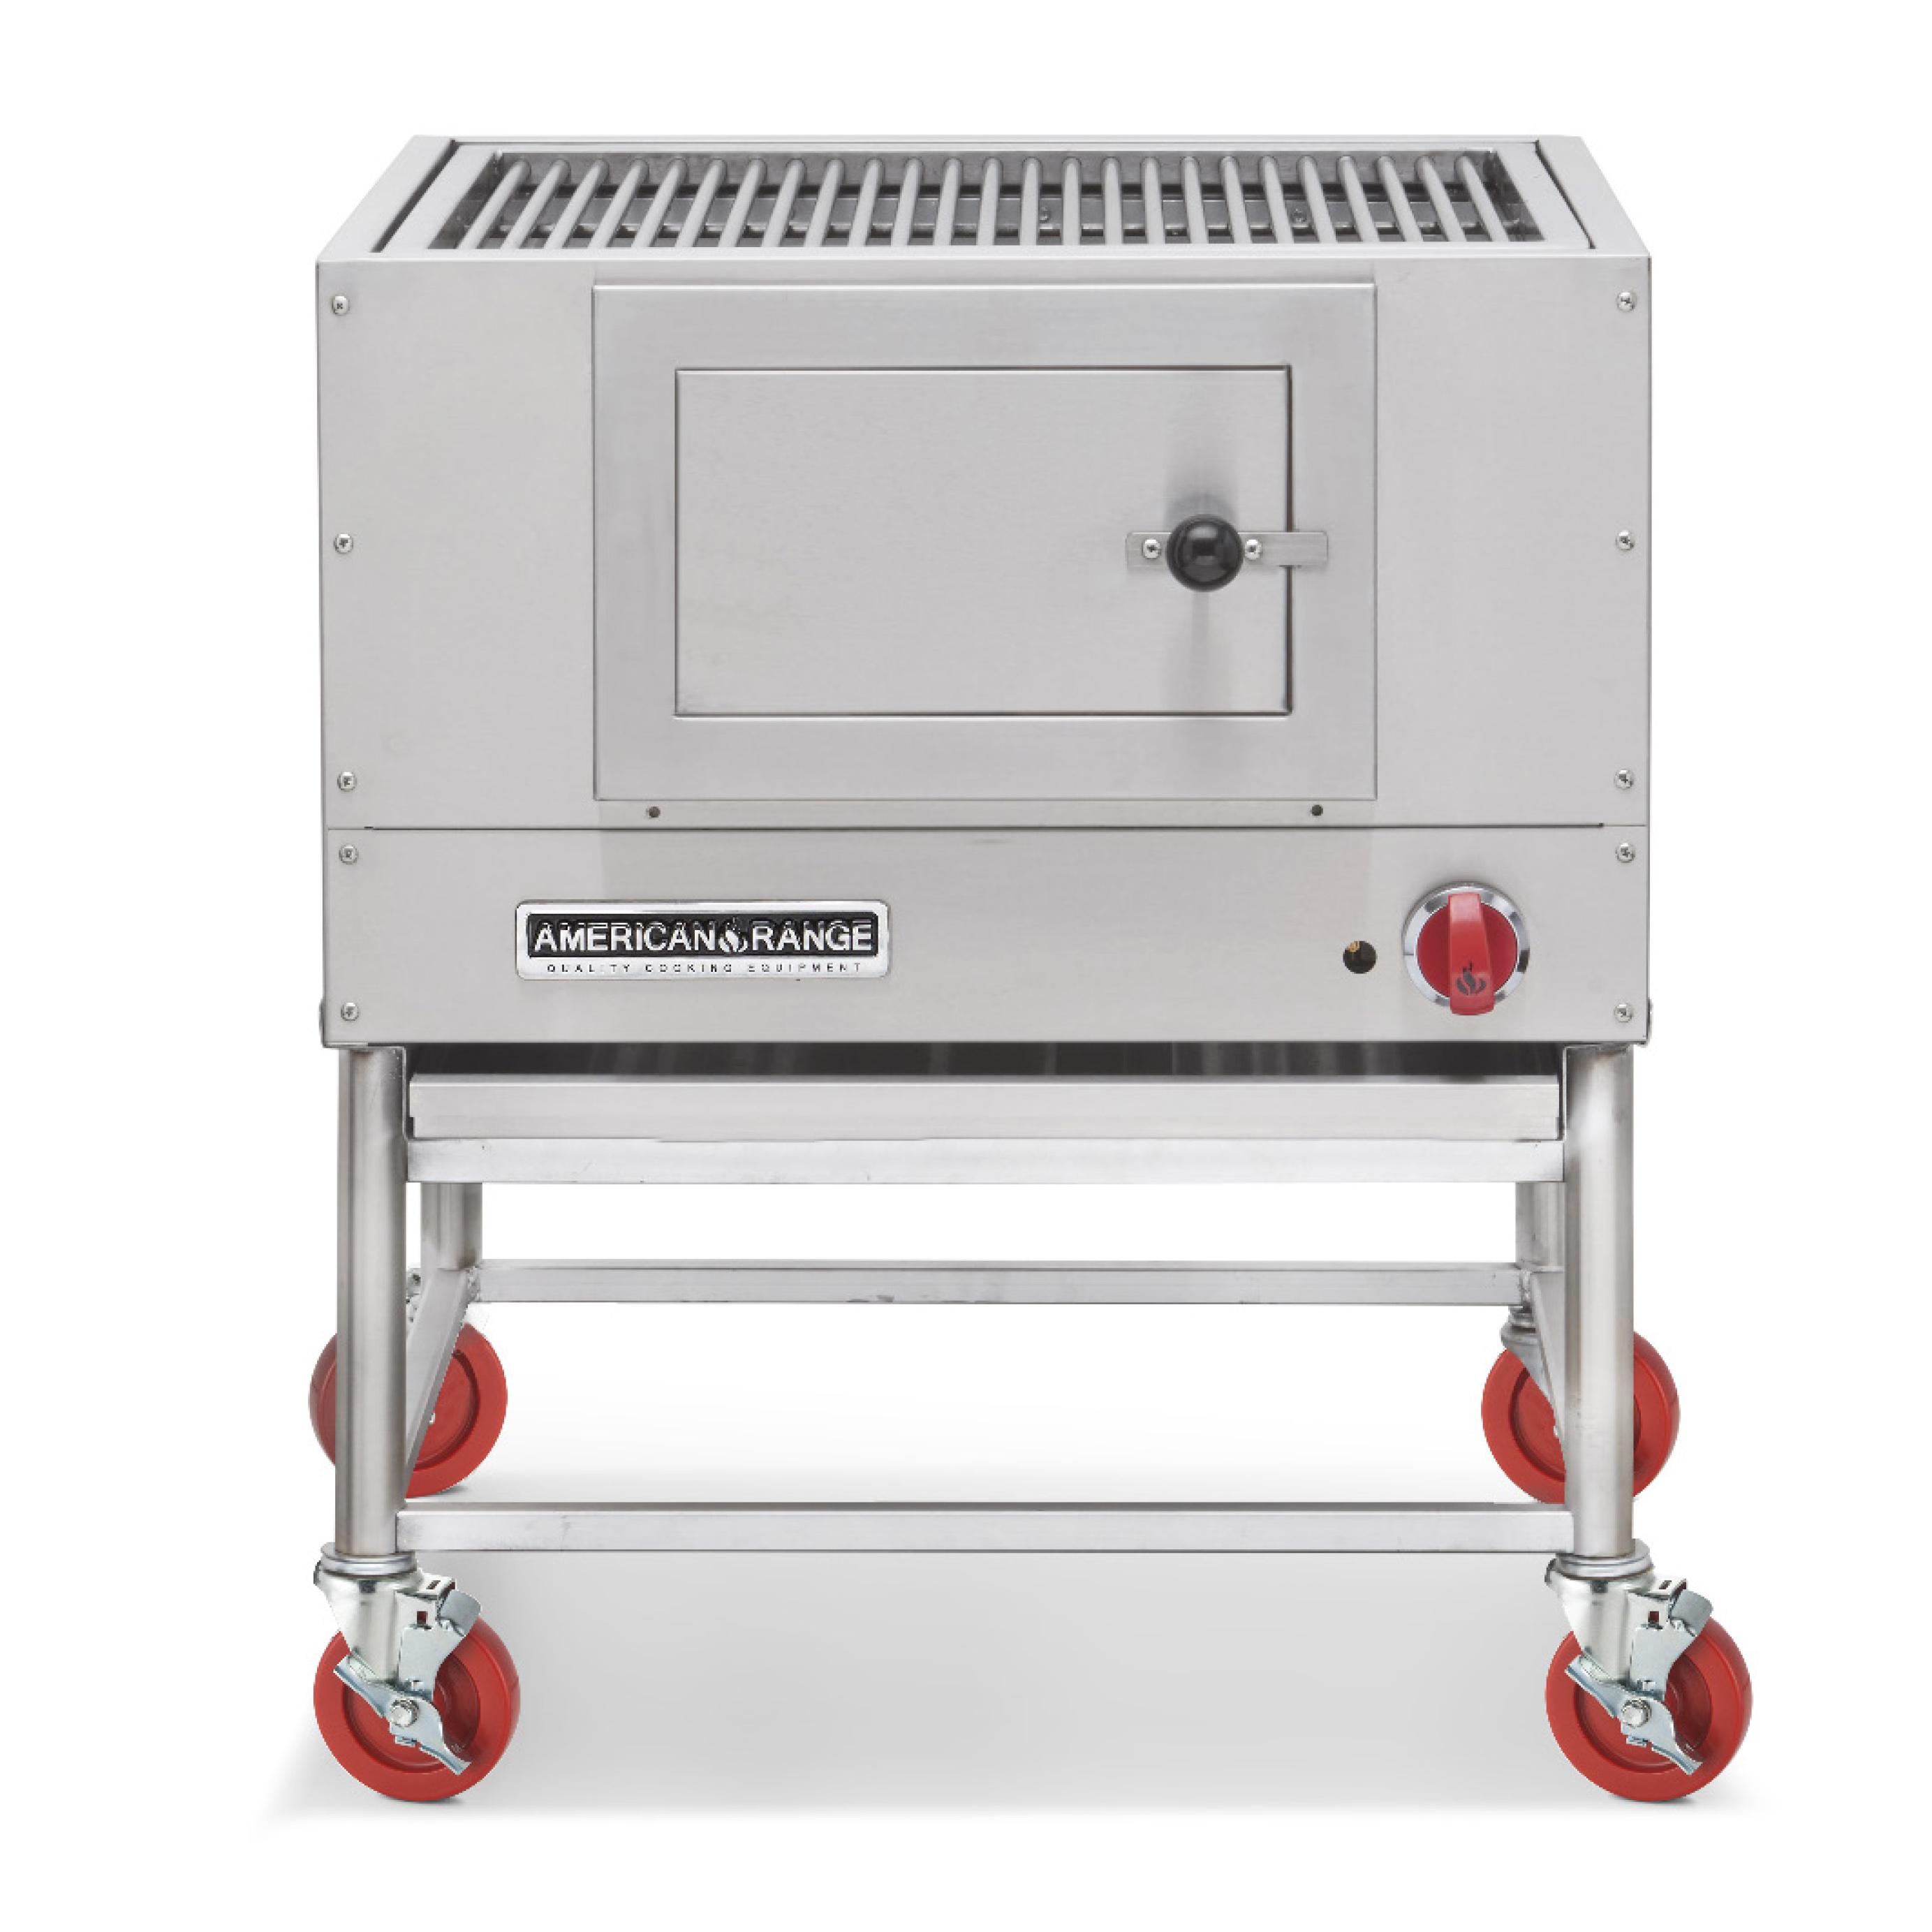 American Range AMSQ-30 charbroiler, wood burning